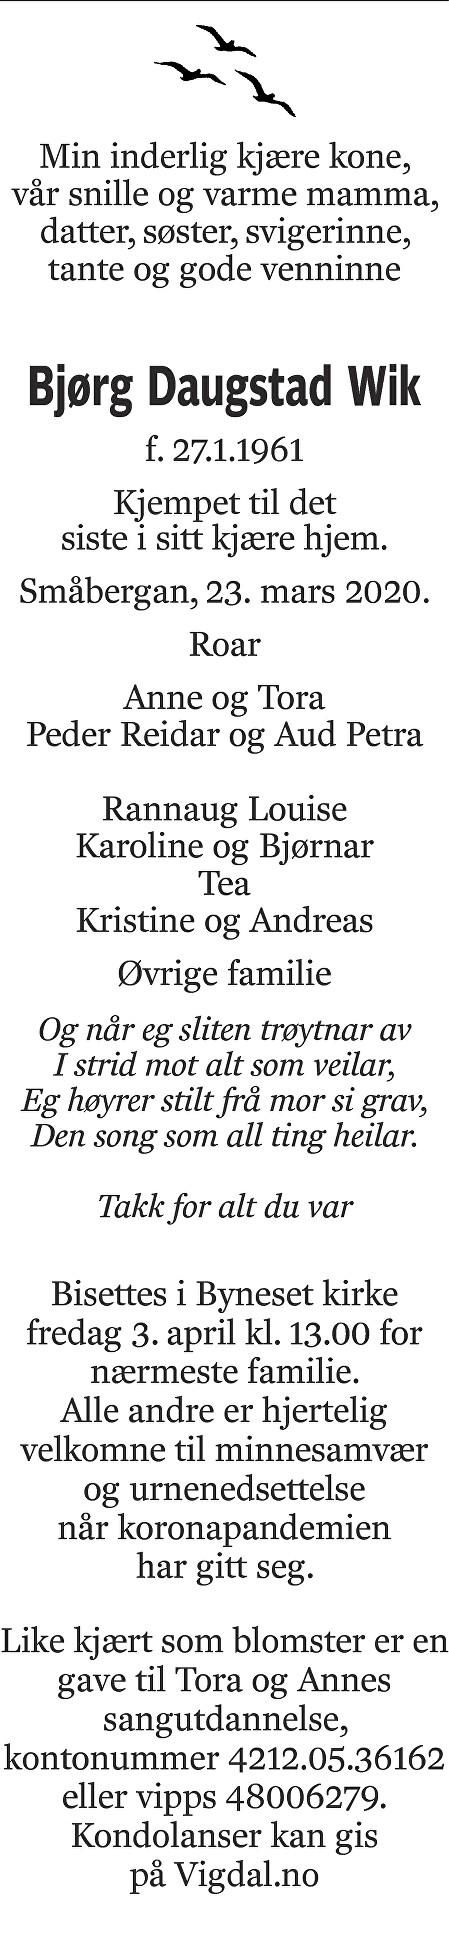 Bjørg Daugstad Wik Dødsannonse